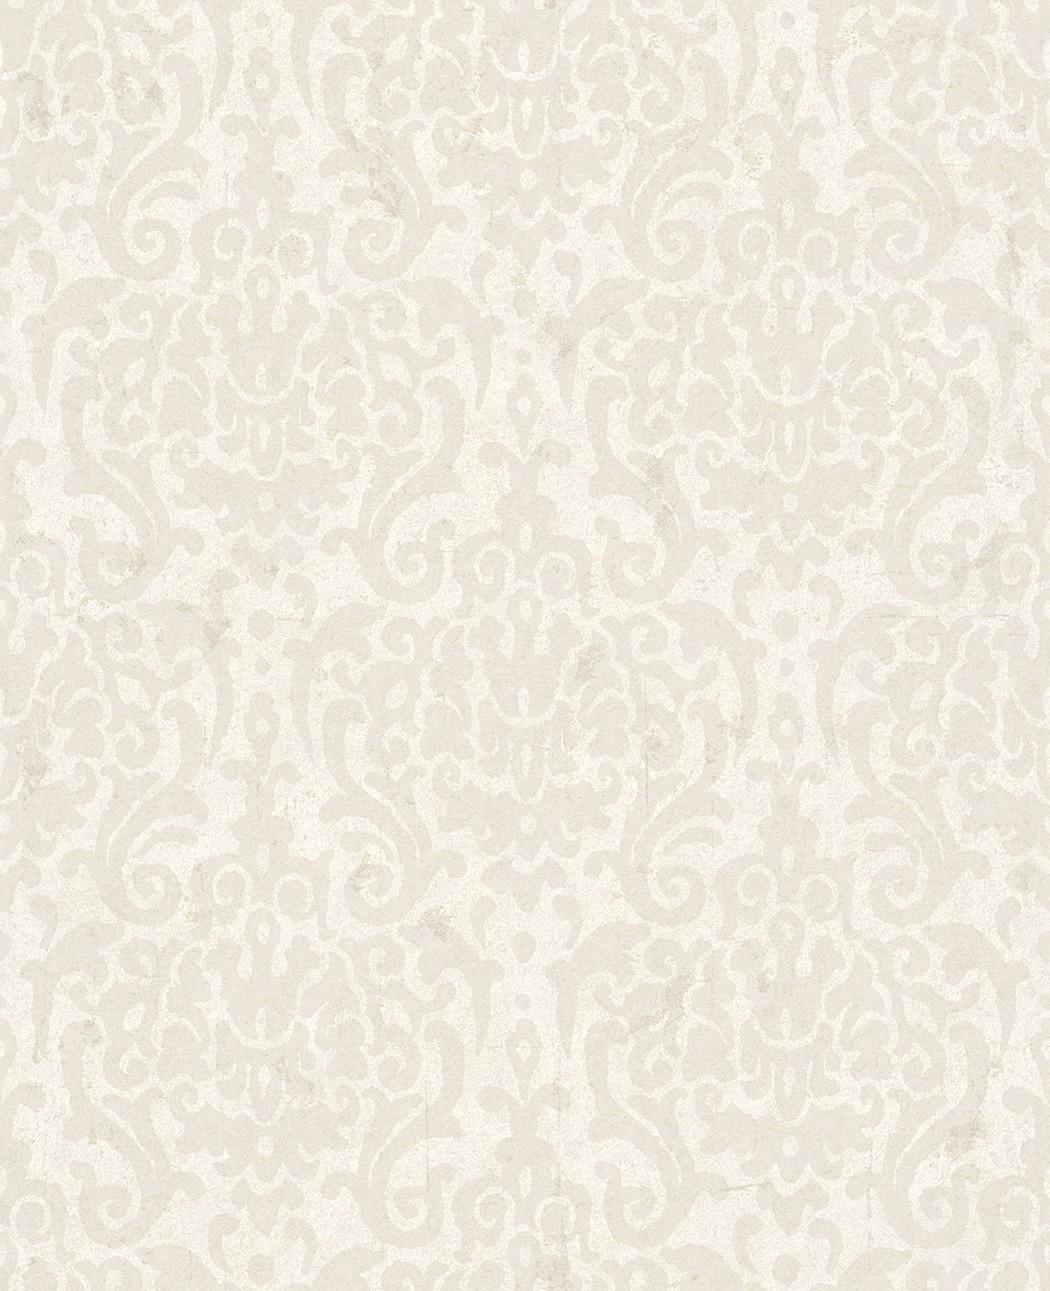 Tapete rasch textil tintura ornament creme 227450 - Tapete textil ...